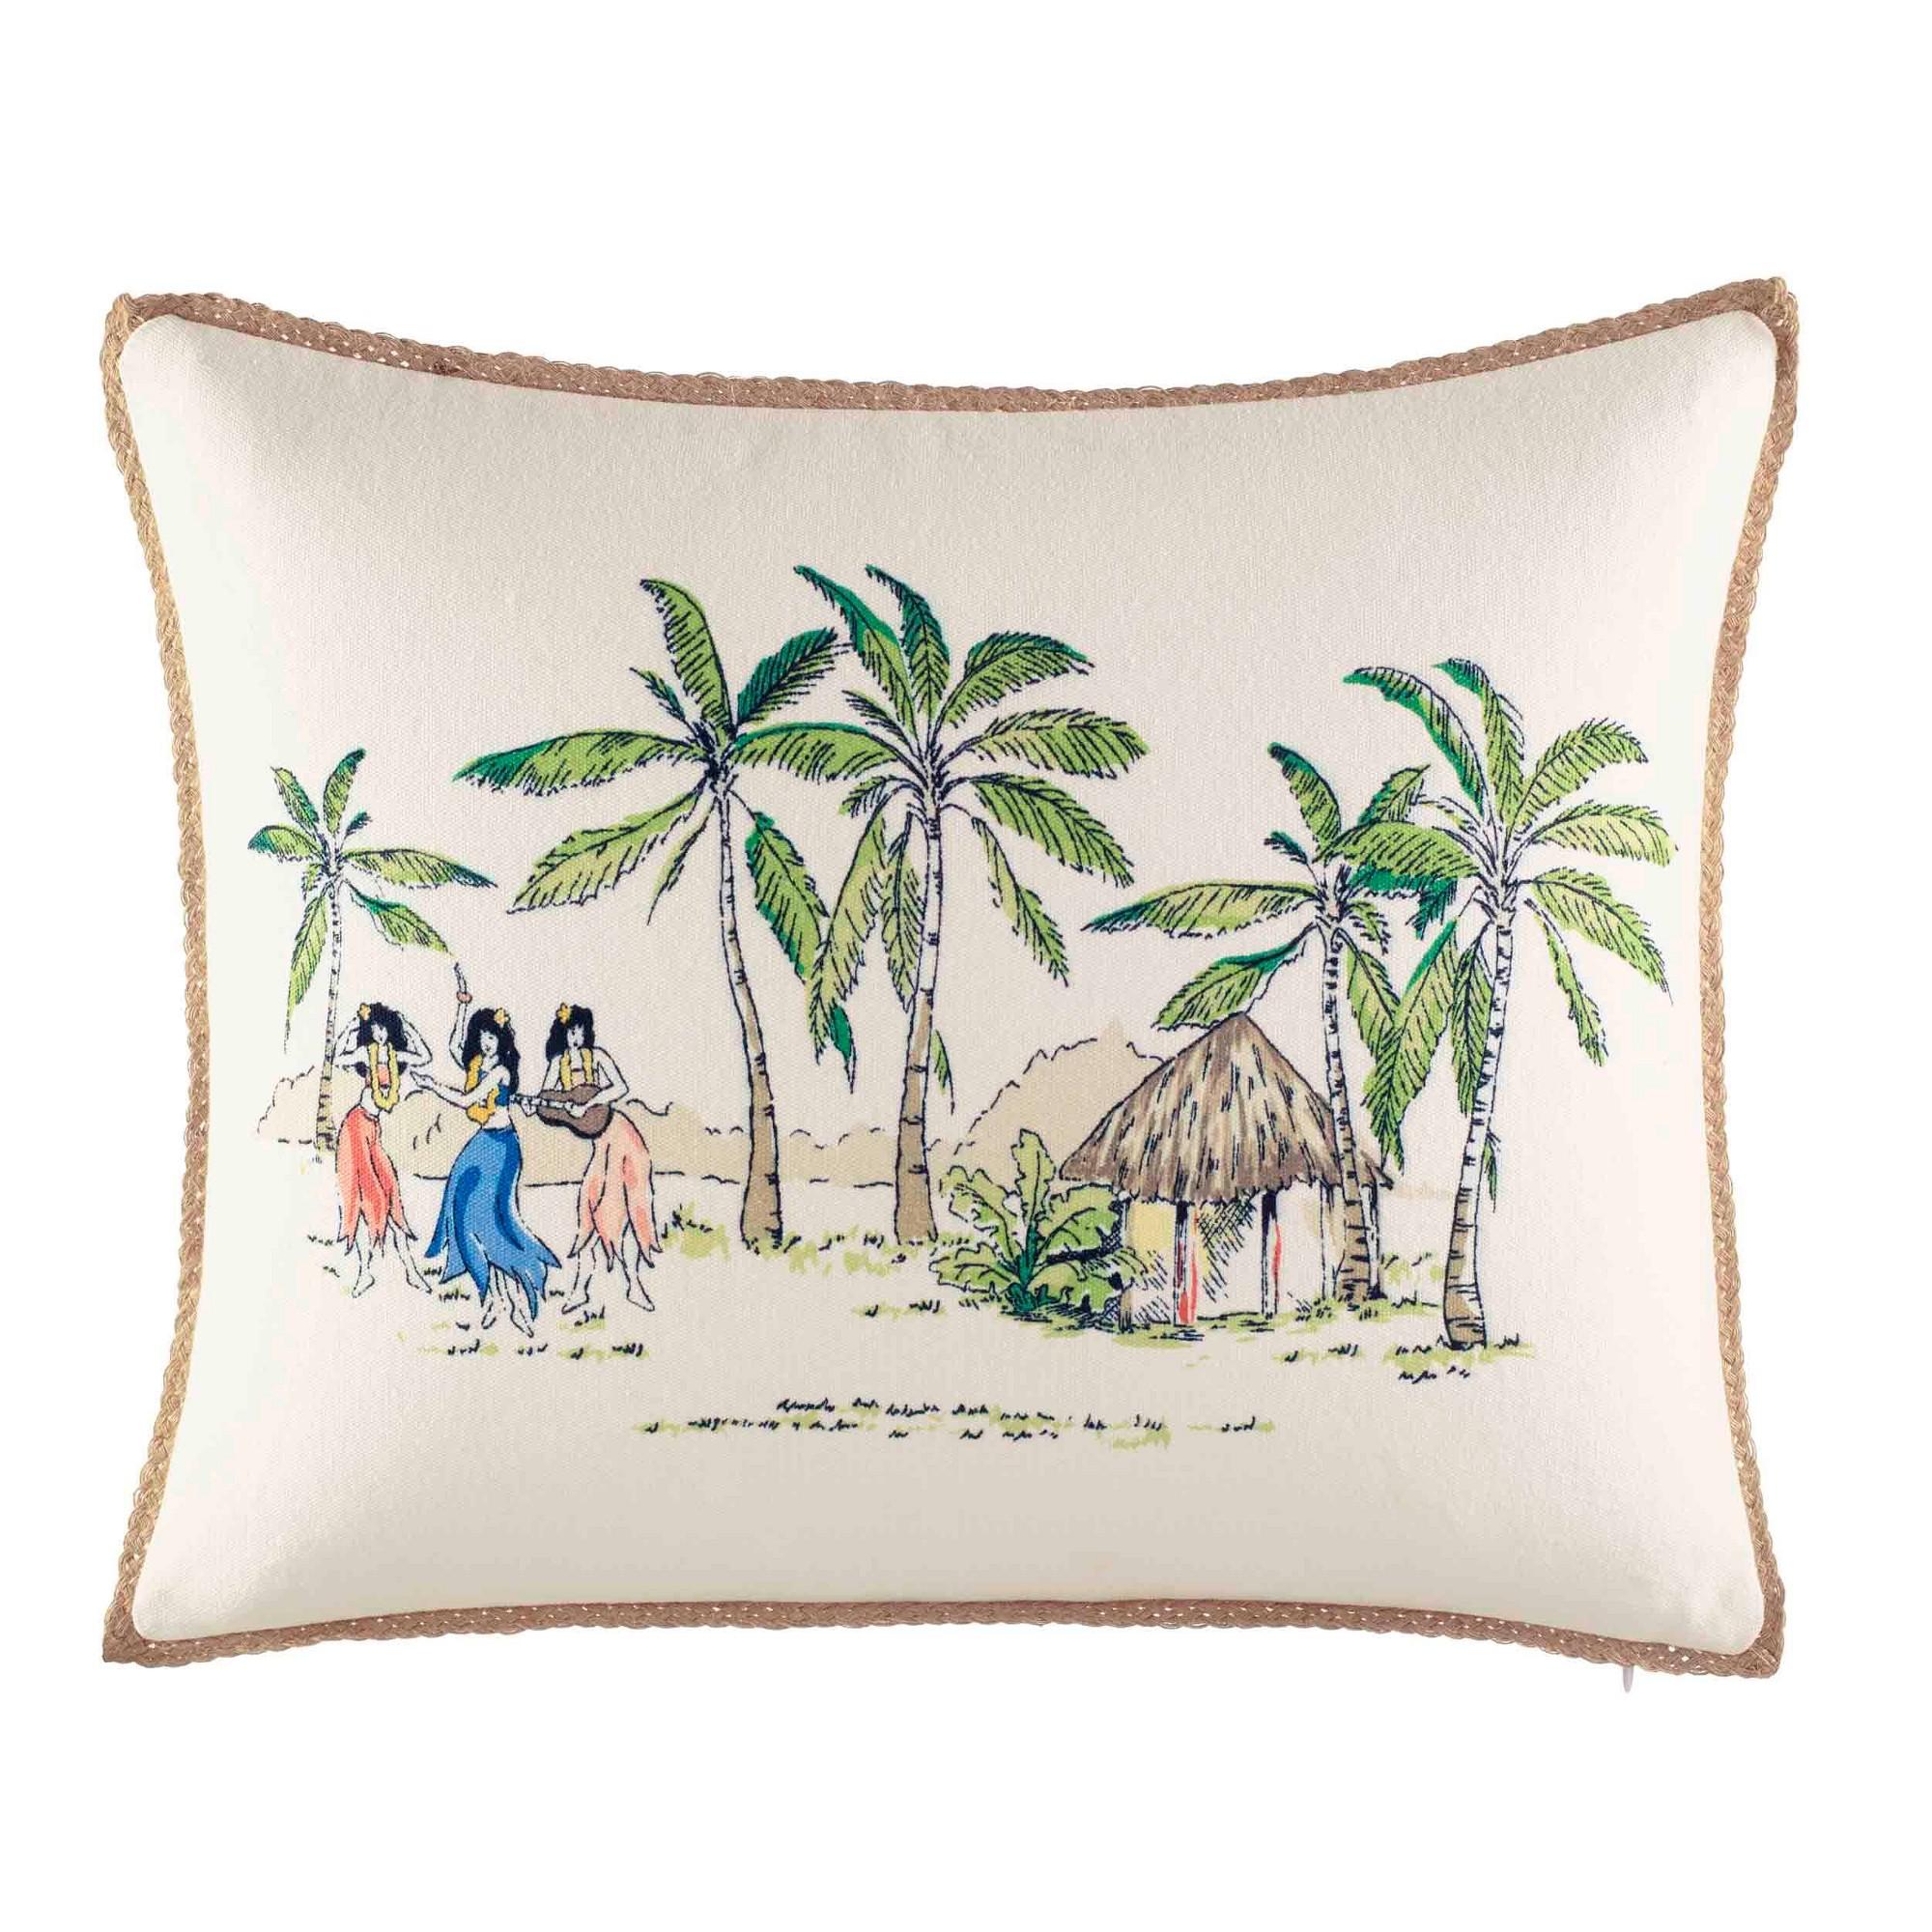 On The Beach Throw Pillow - Nine Palms, Green